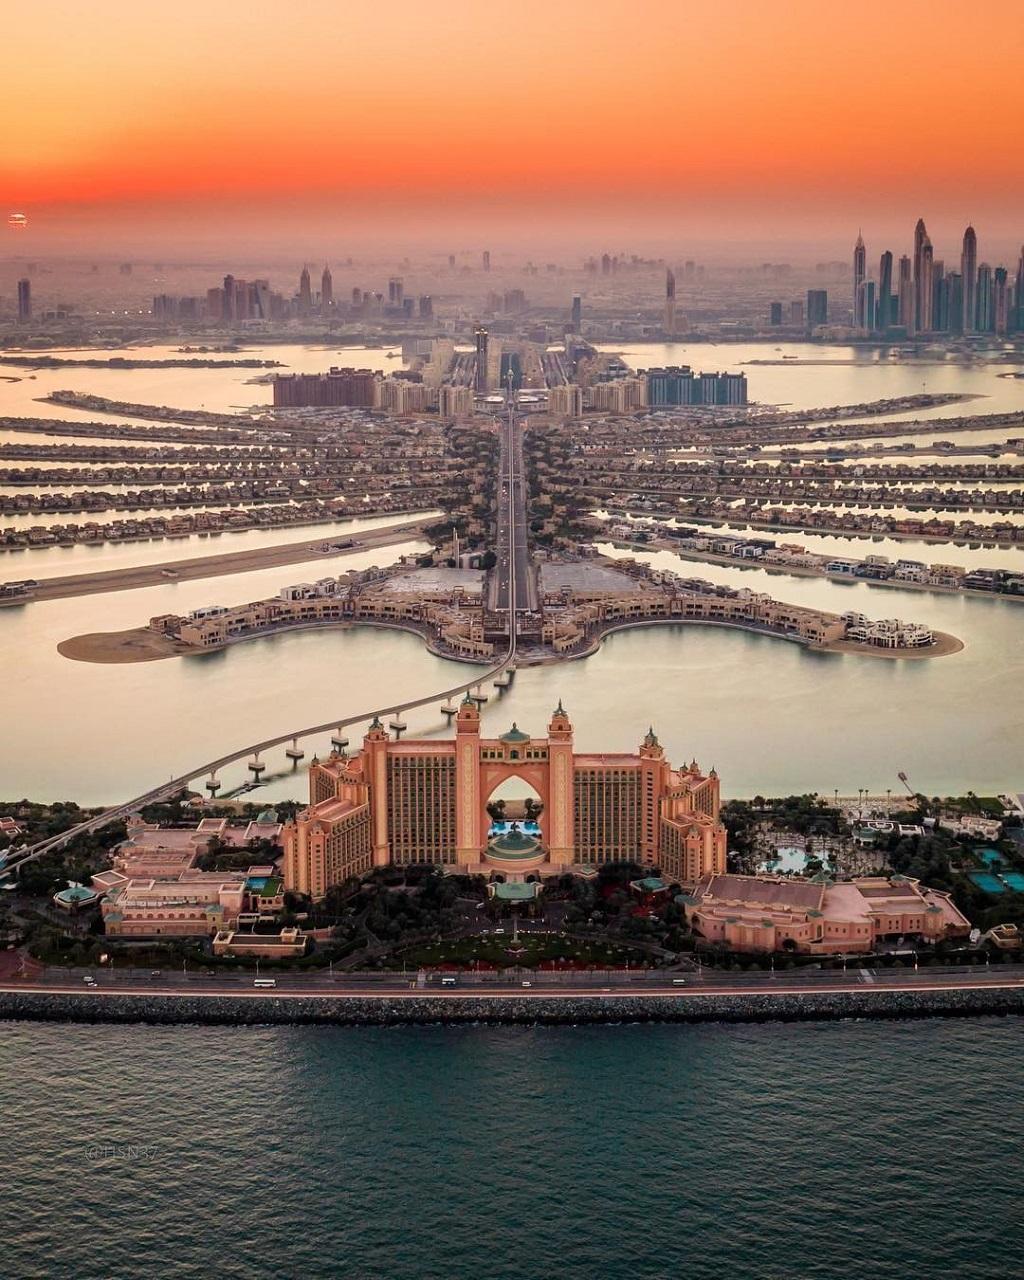 Отель Атлантис на фото с вертолета в Дубае